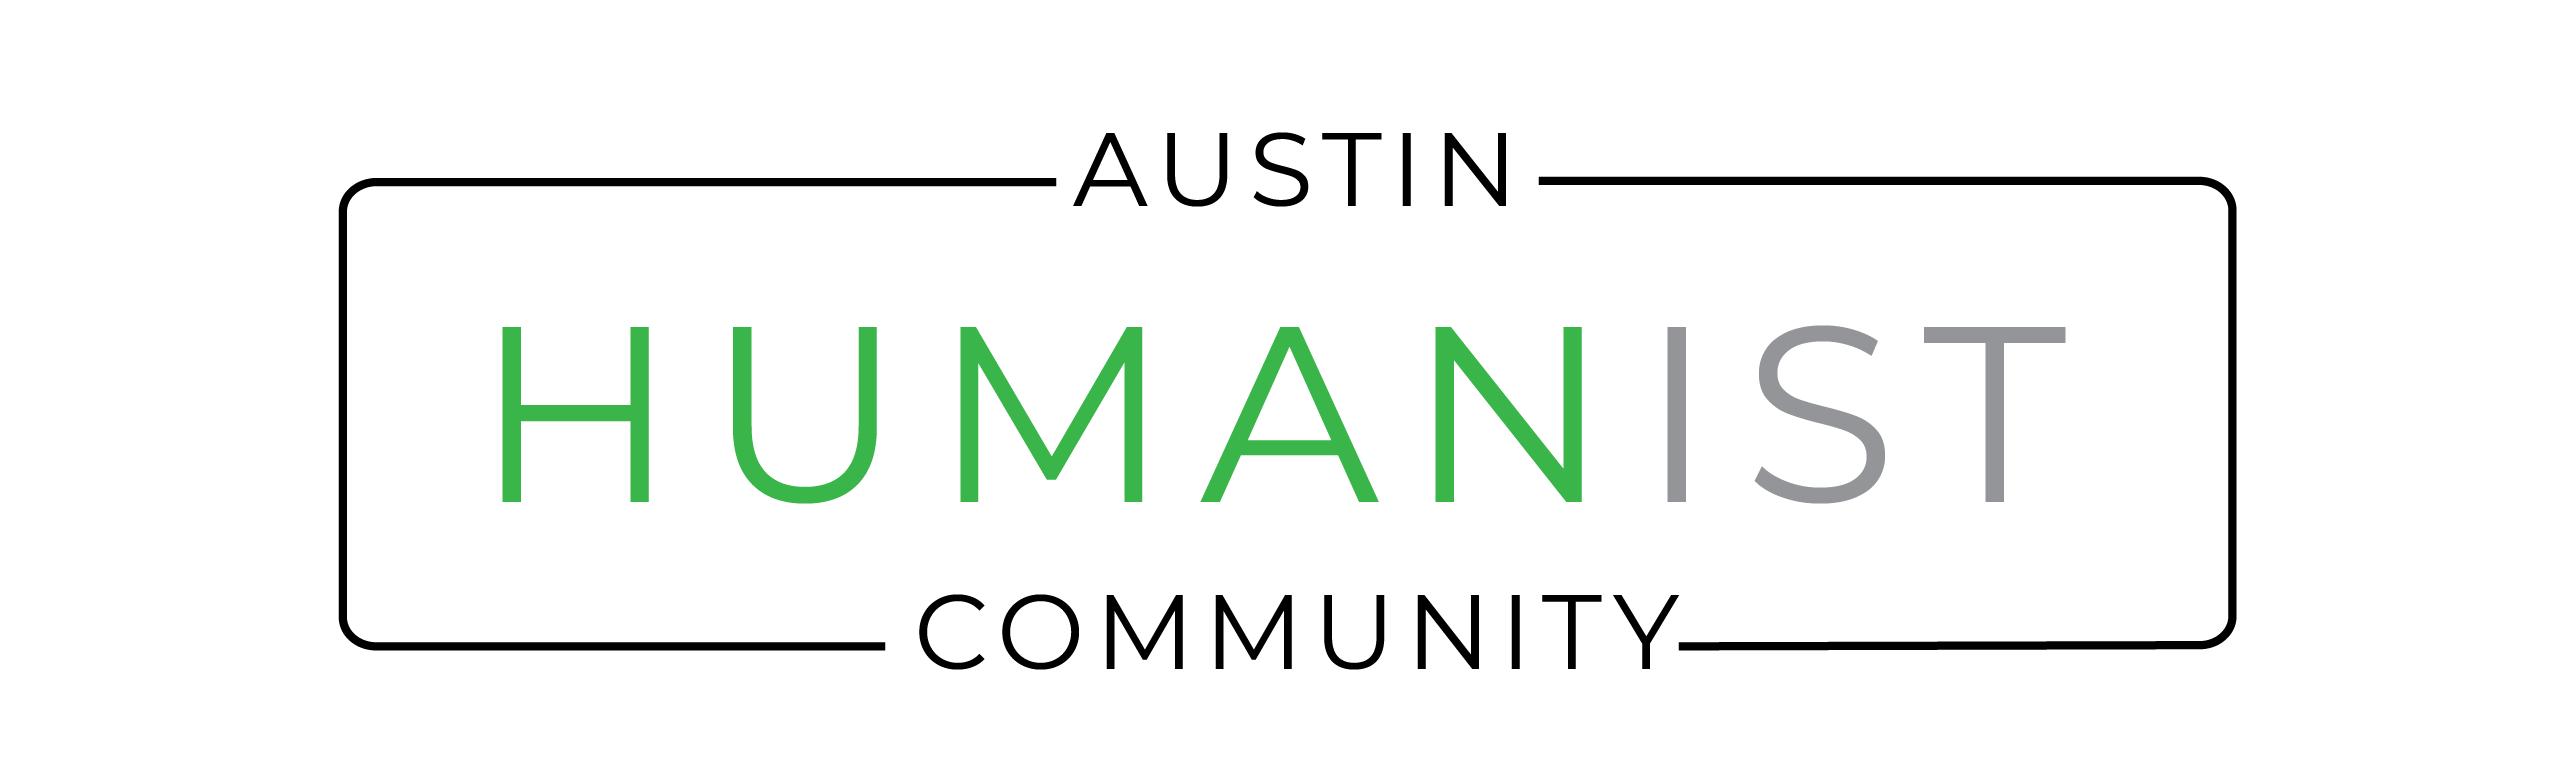 Austin Humanist Community